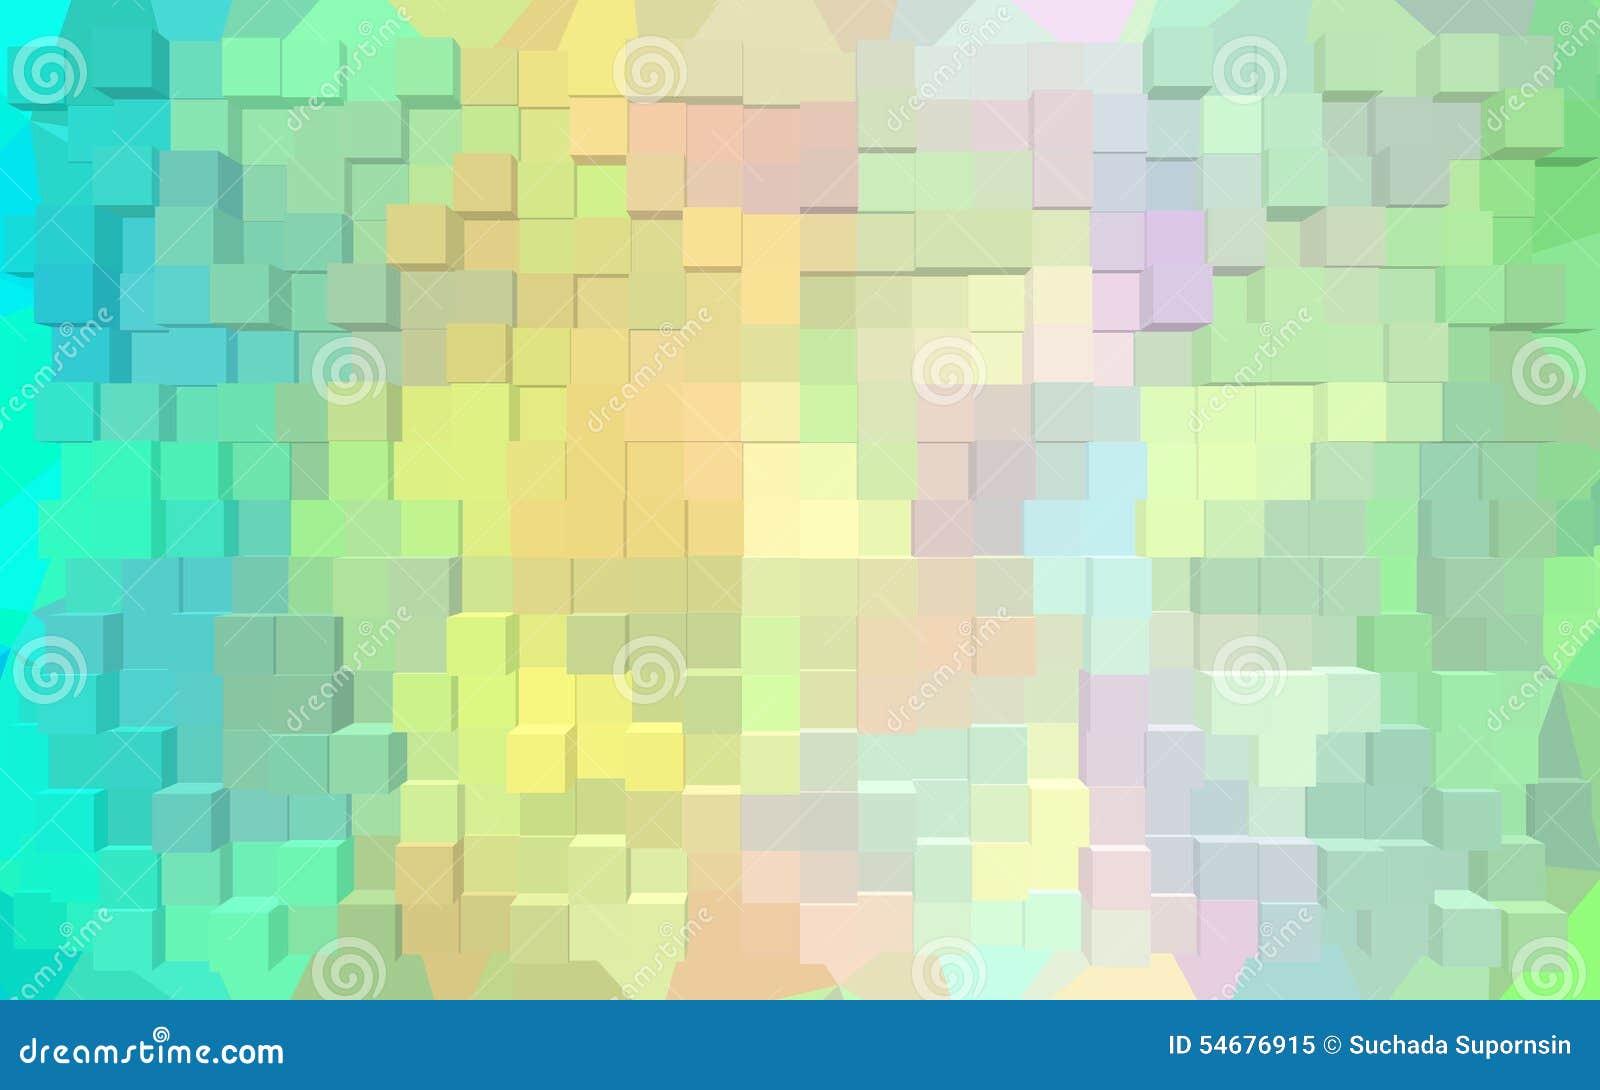 Abstract Block Pattern Wallpaper. Stock Illustration - Illustration ...